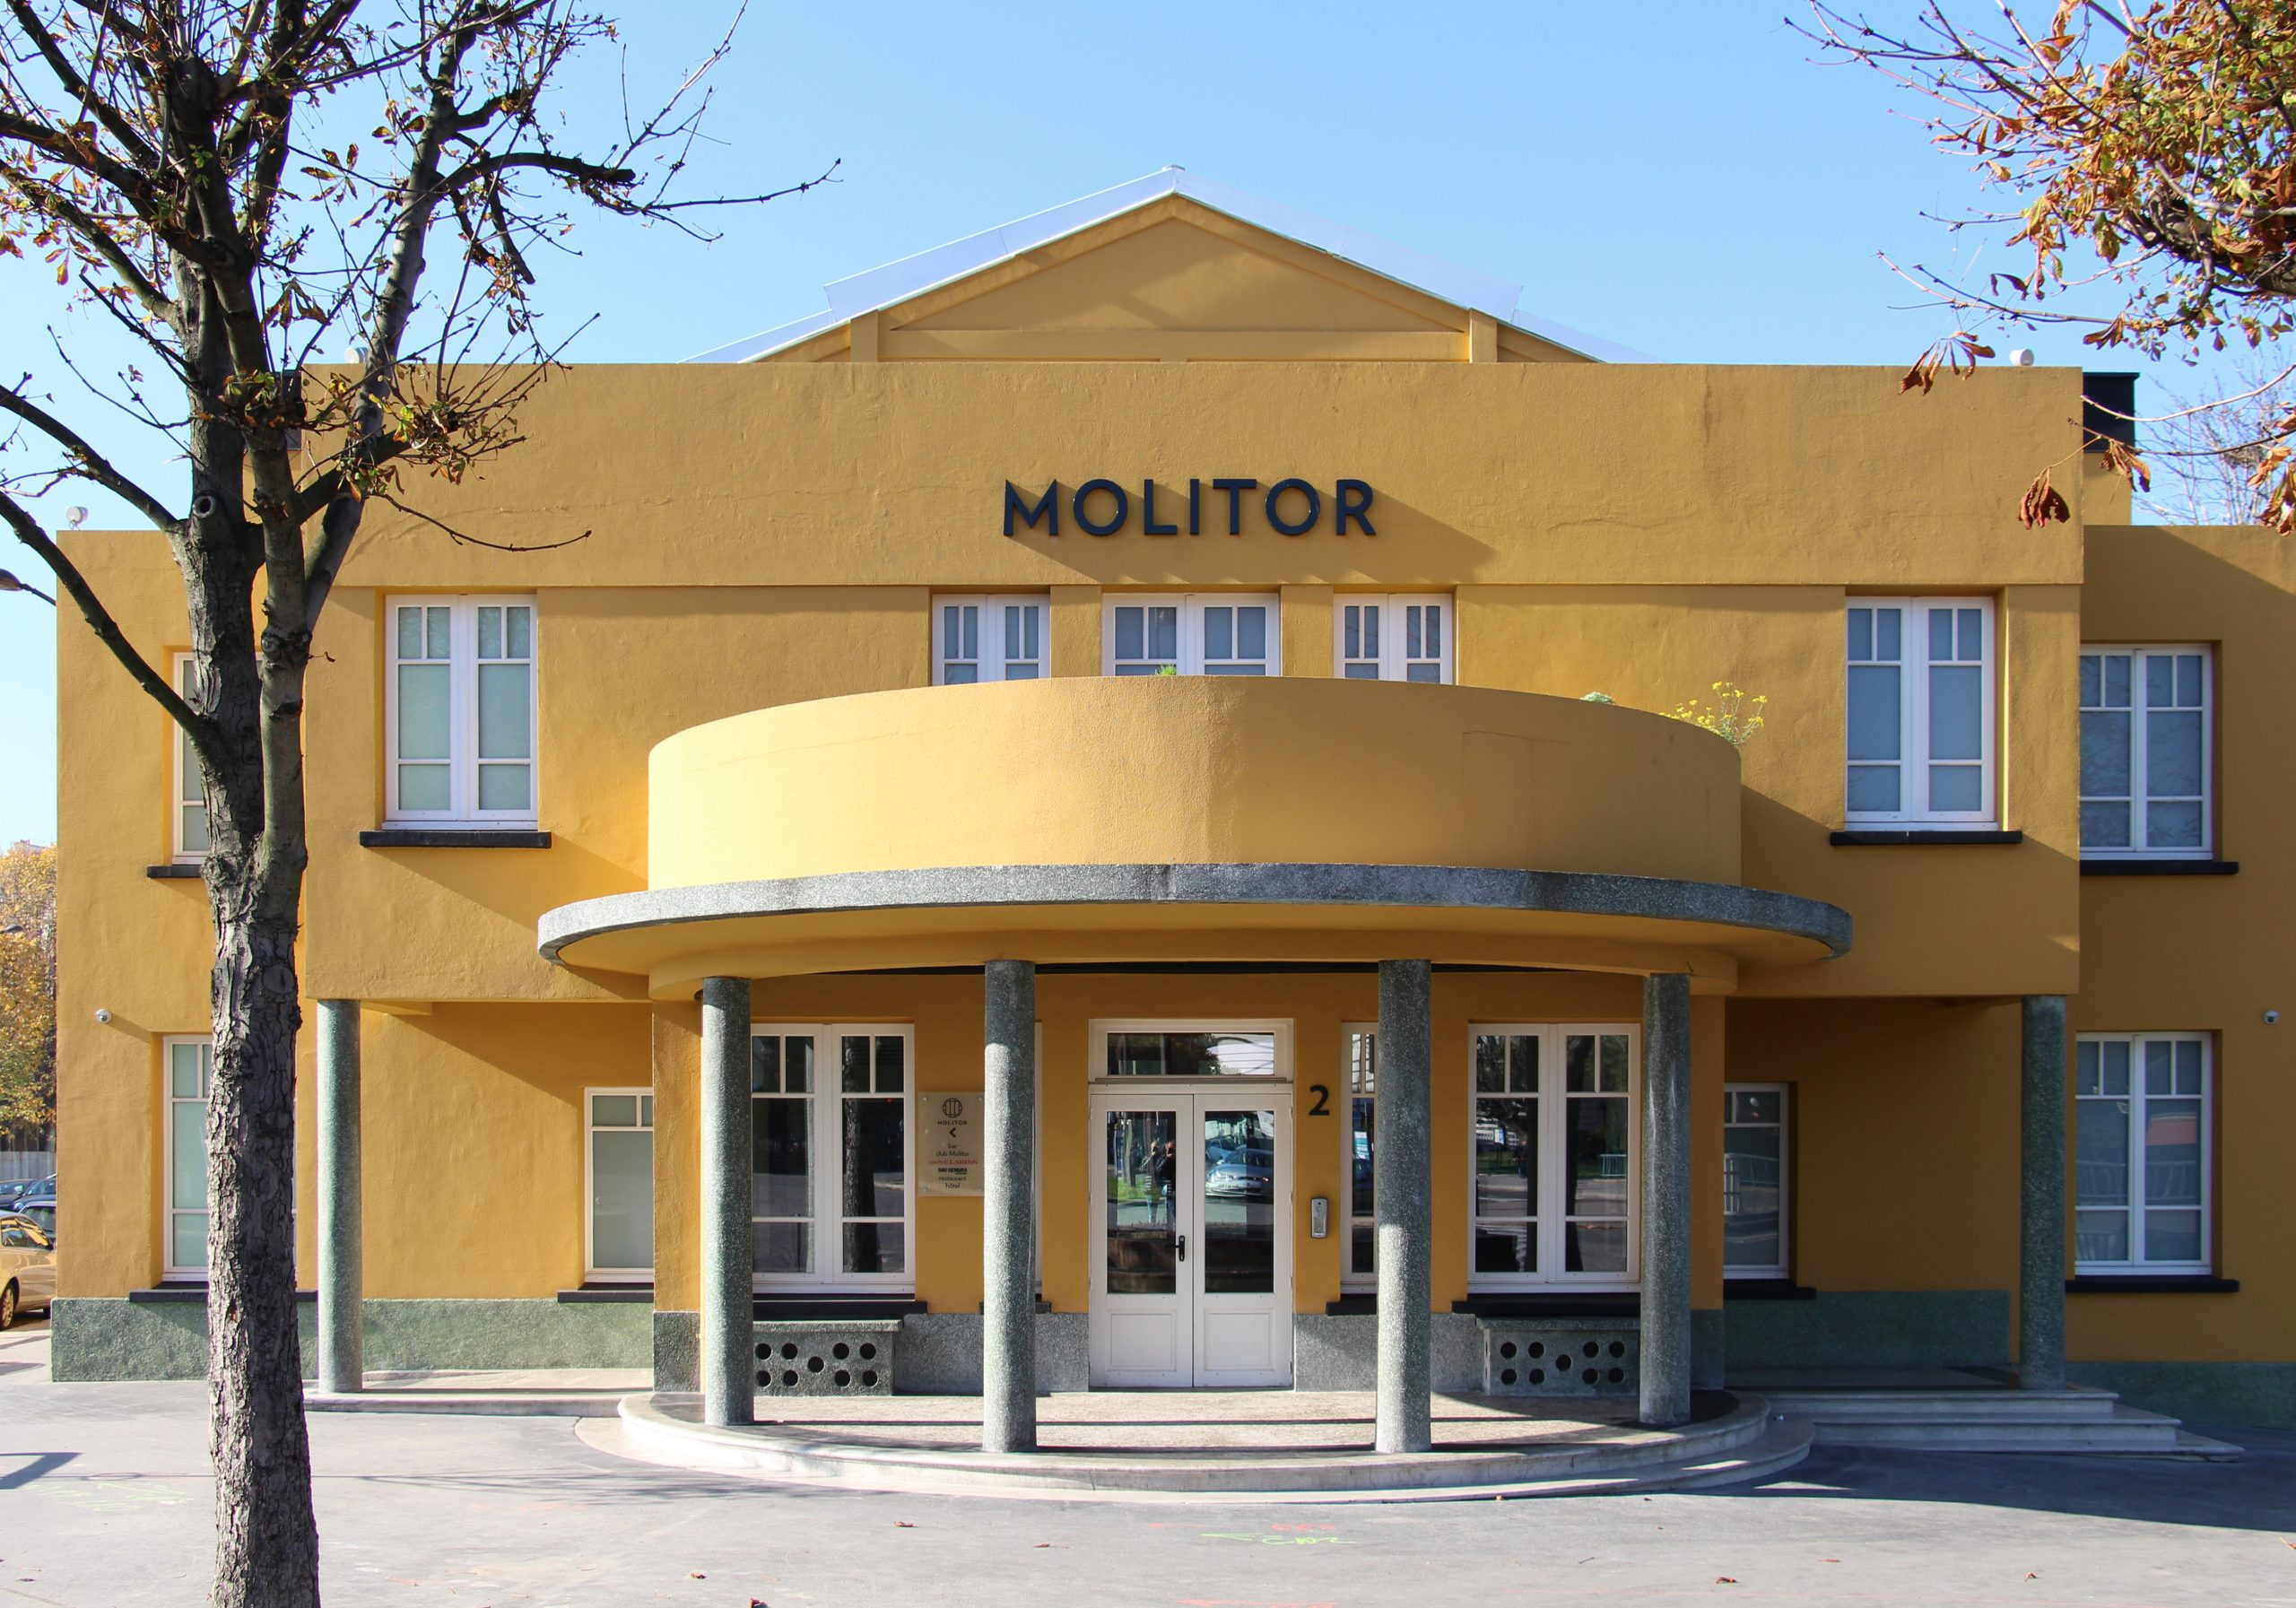 File:paris, Piscine Molitor, 1 November 2015 001.jpg ... pour Piscine Molitor Restaurant